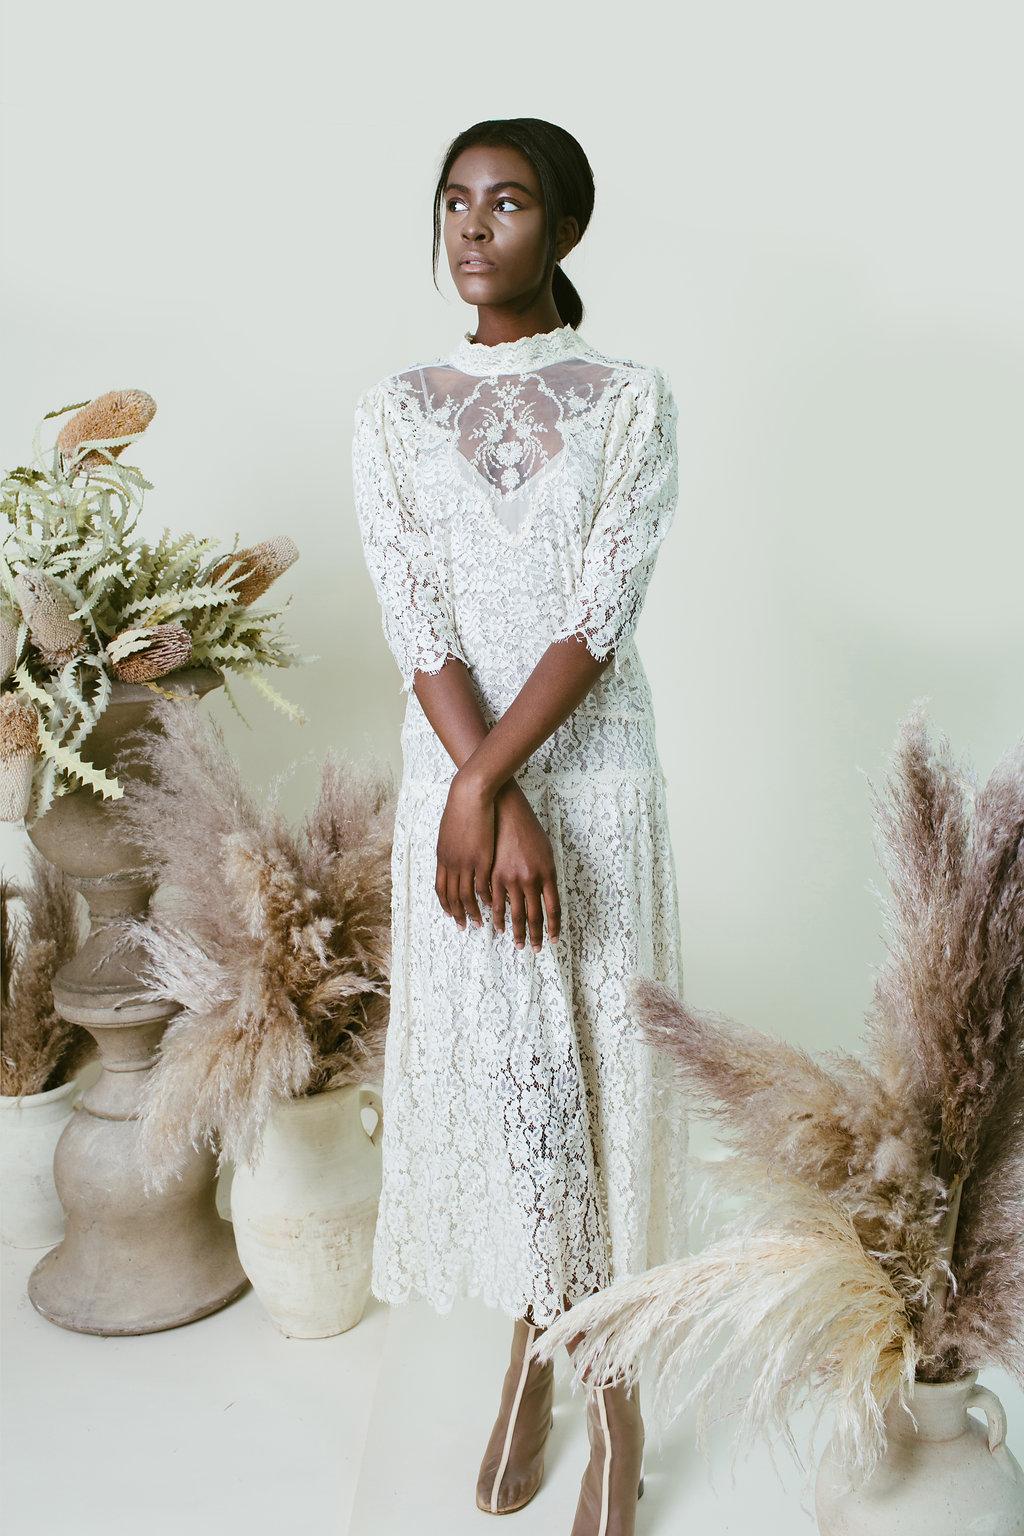 Paige-Newton-Editorial-Wedding-Photography-Victorian-Bride.jpg